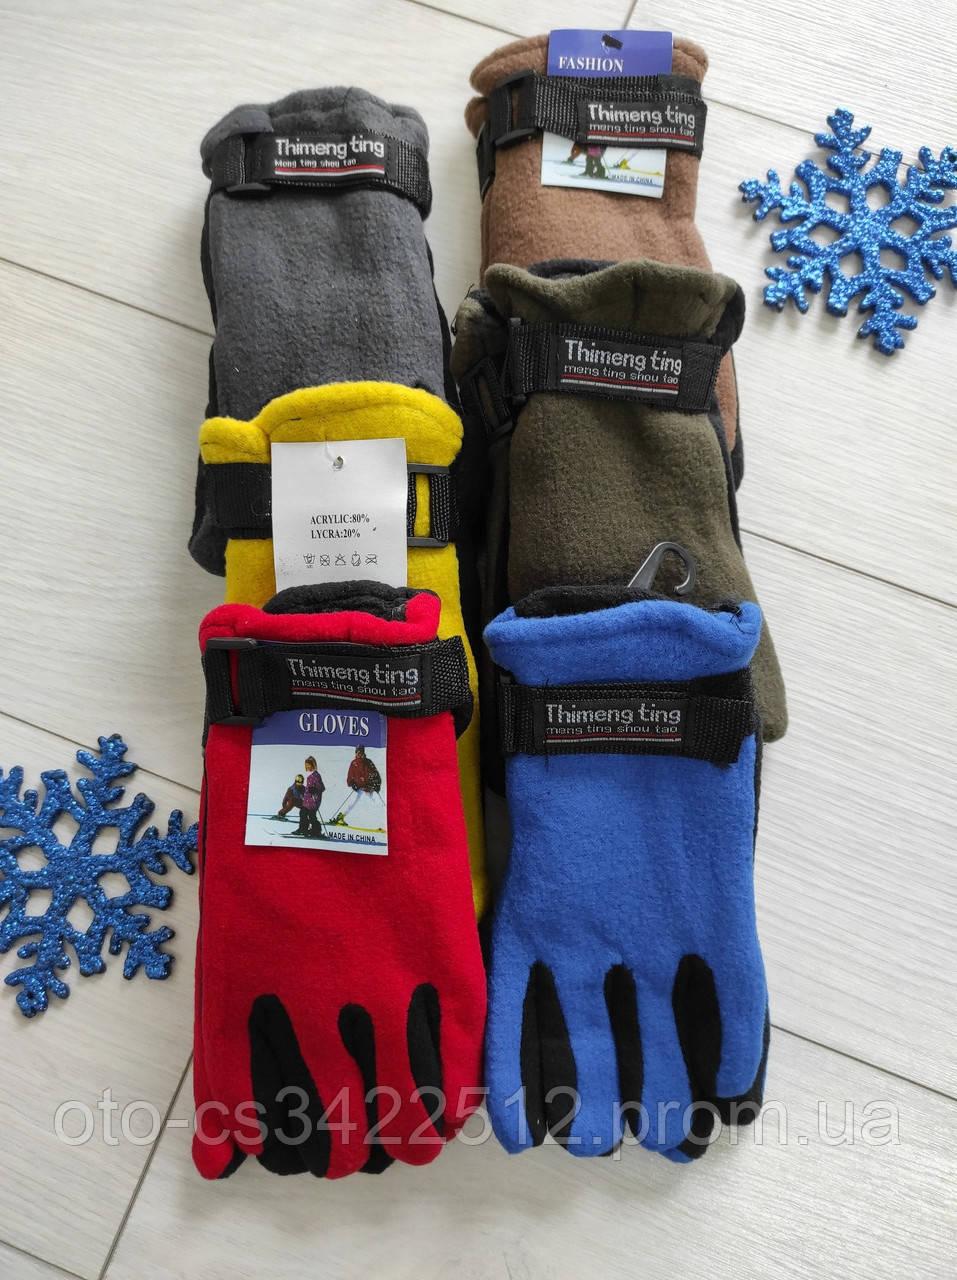 Рукавиці дитячі Fashion Gloves